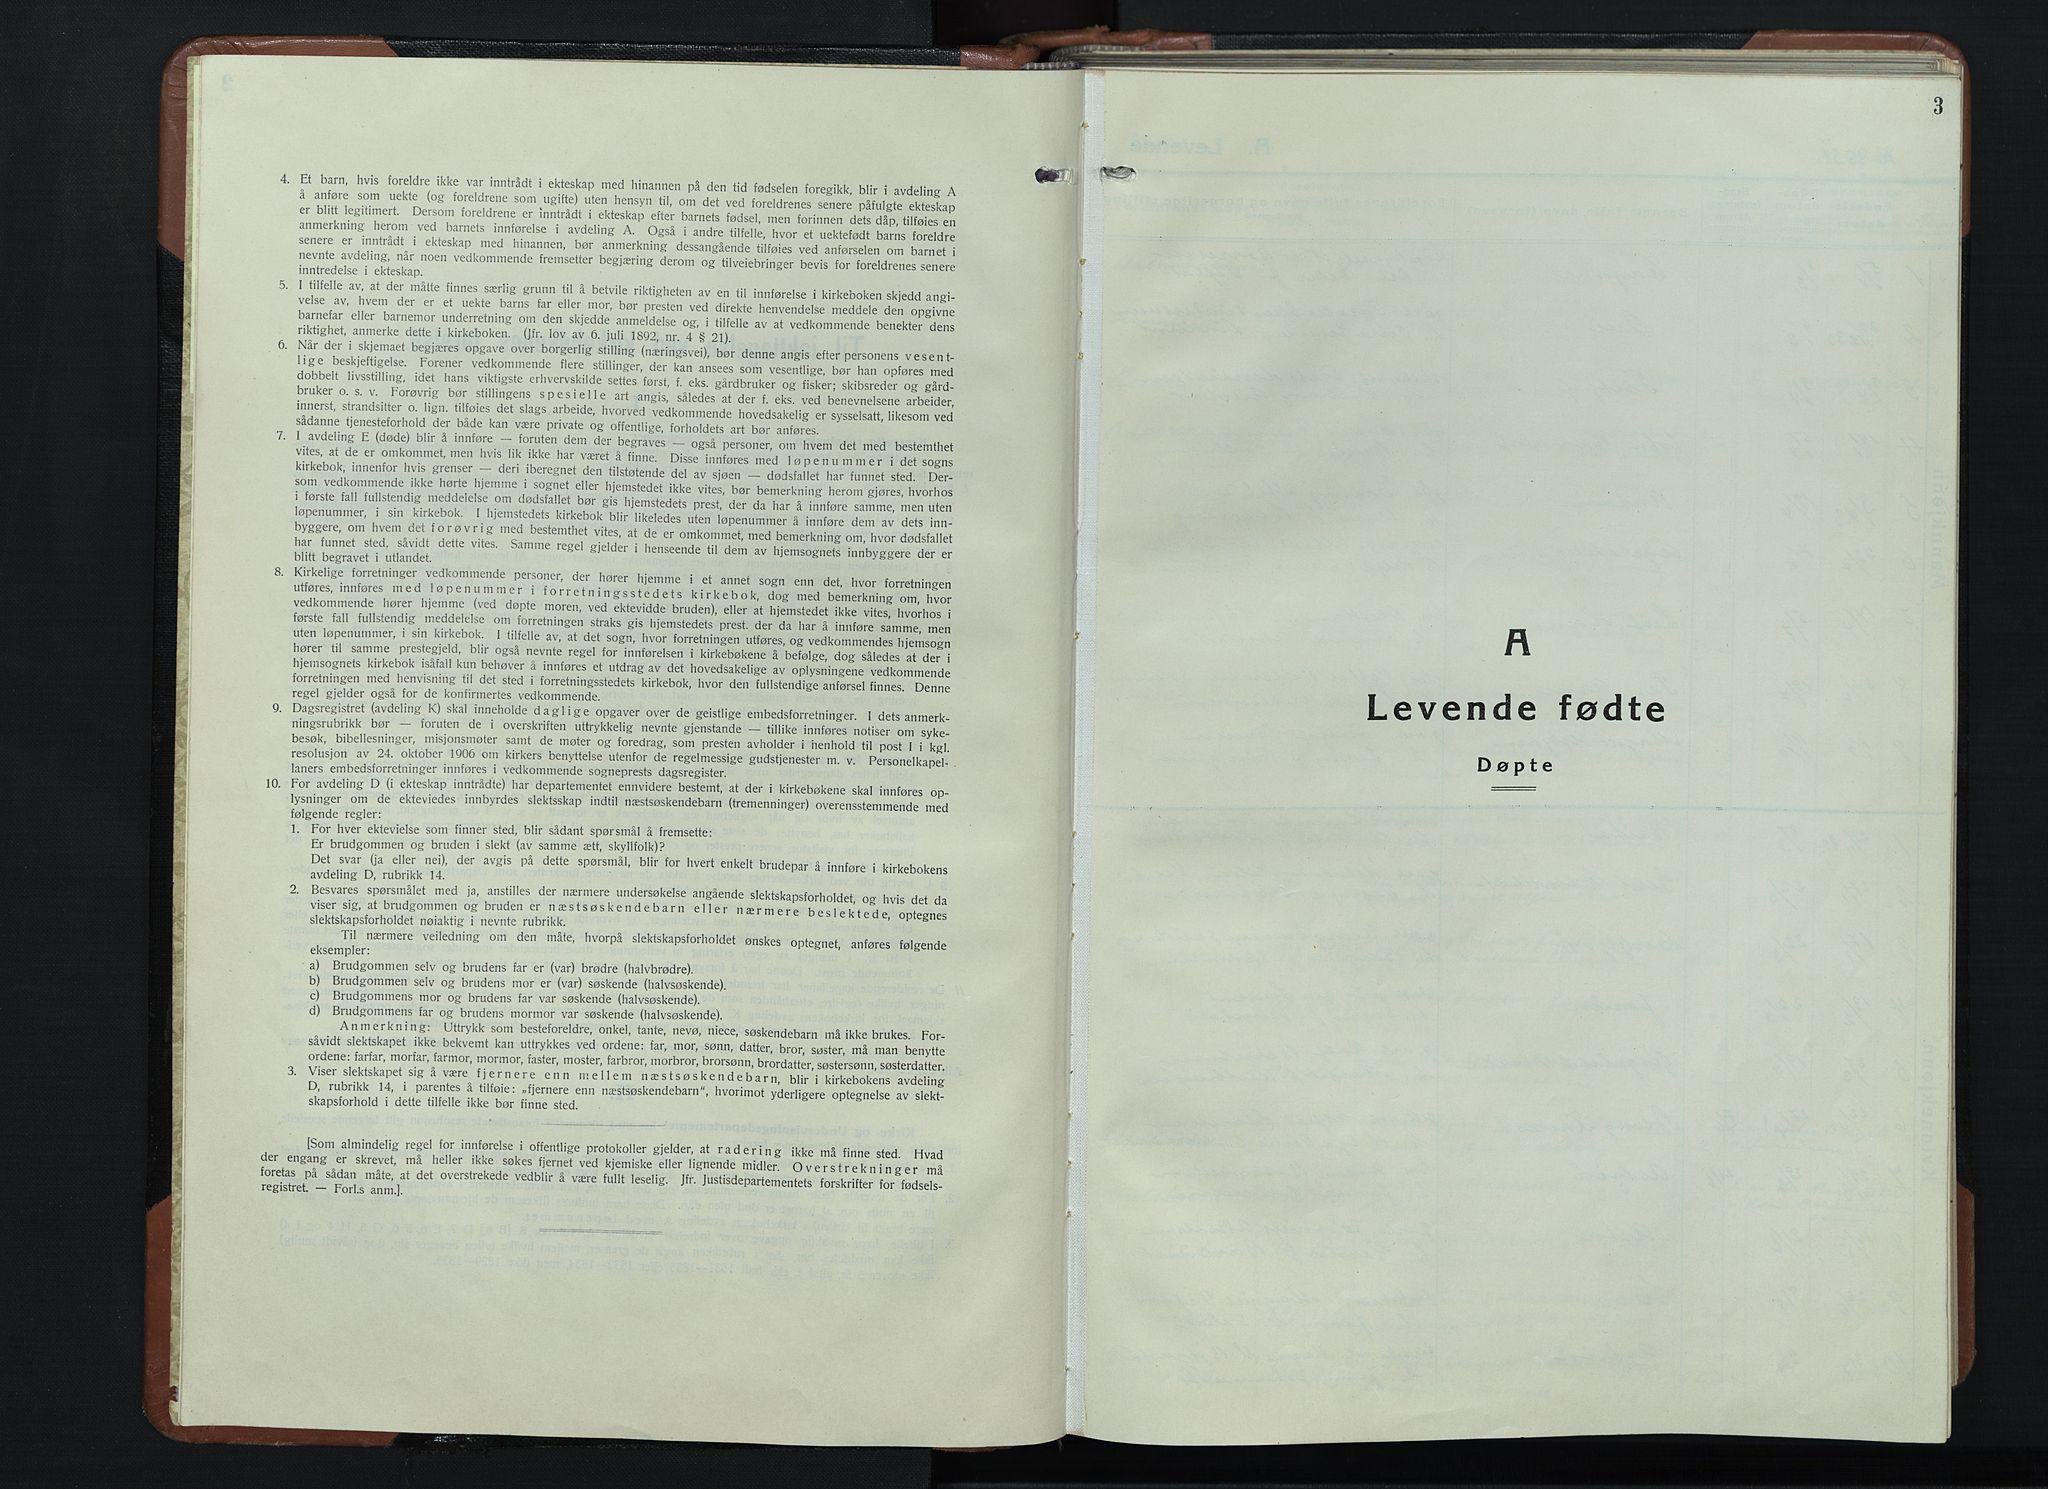 SAH, Vardal prestekontor, H/Ha/Hab/L0018: Klokkerbok nr. 18, 1931-1951, s. 3